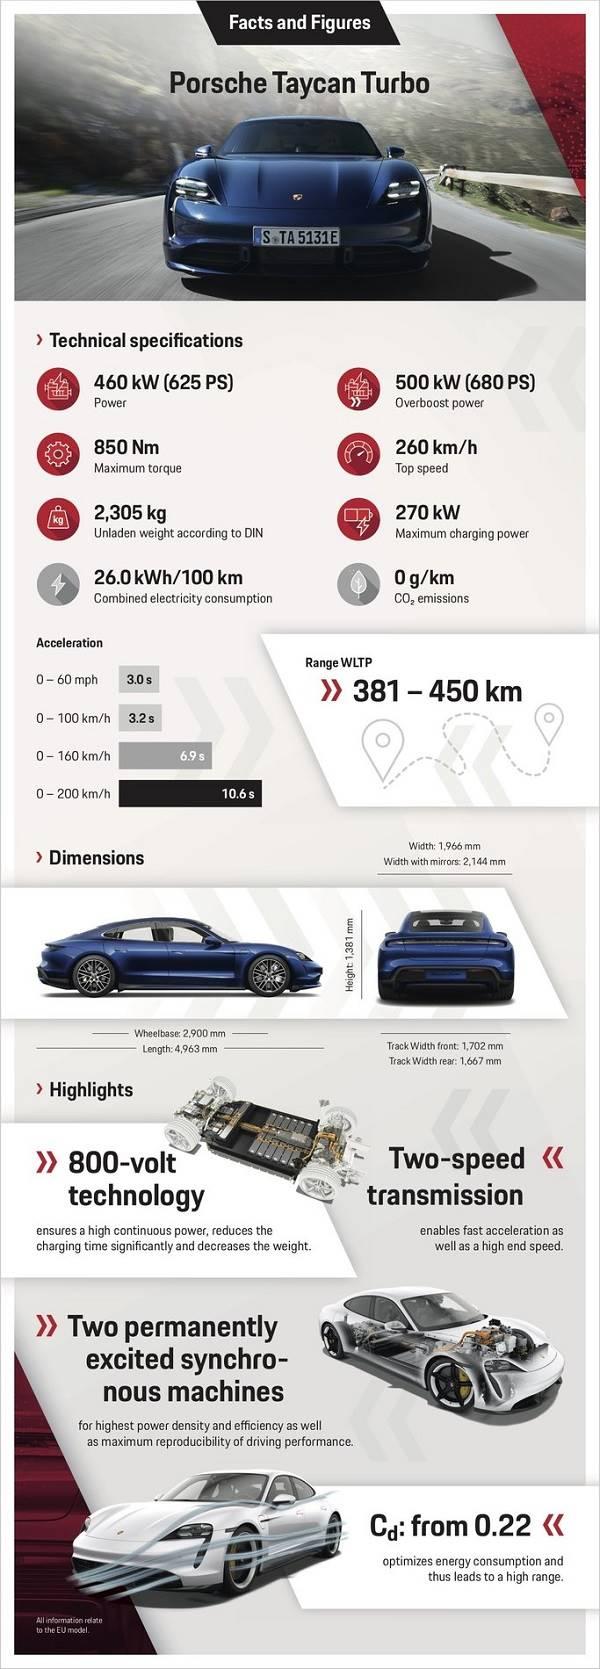 Porsche Taycan - Mewah, Cepat, Tetapi Ramah Lingkungan - Brosur turbo B